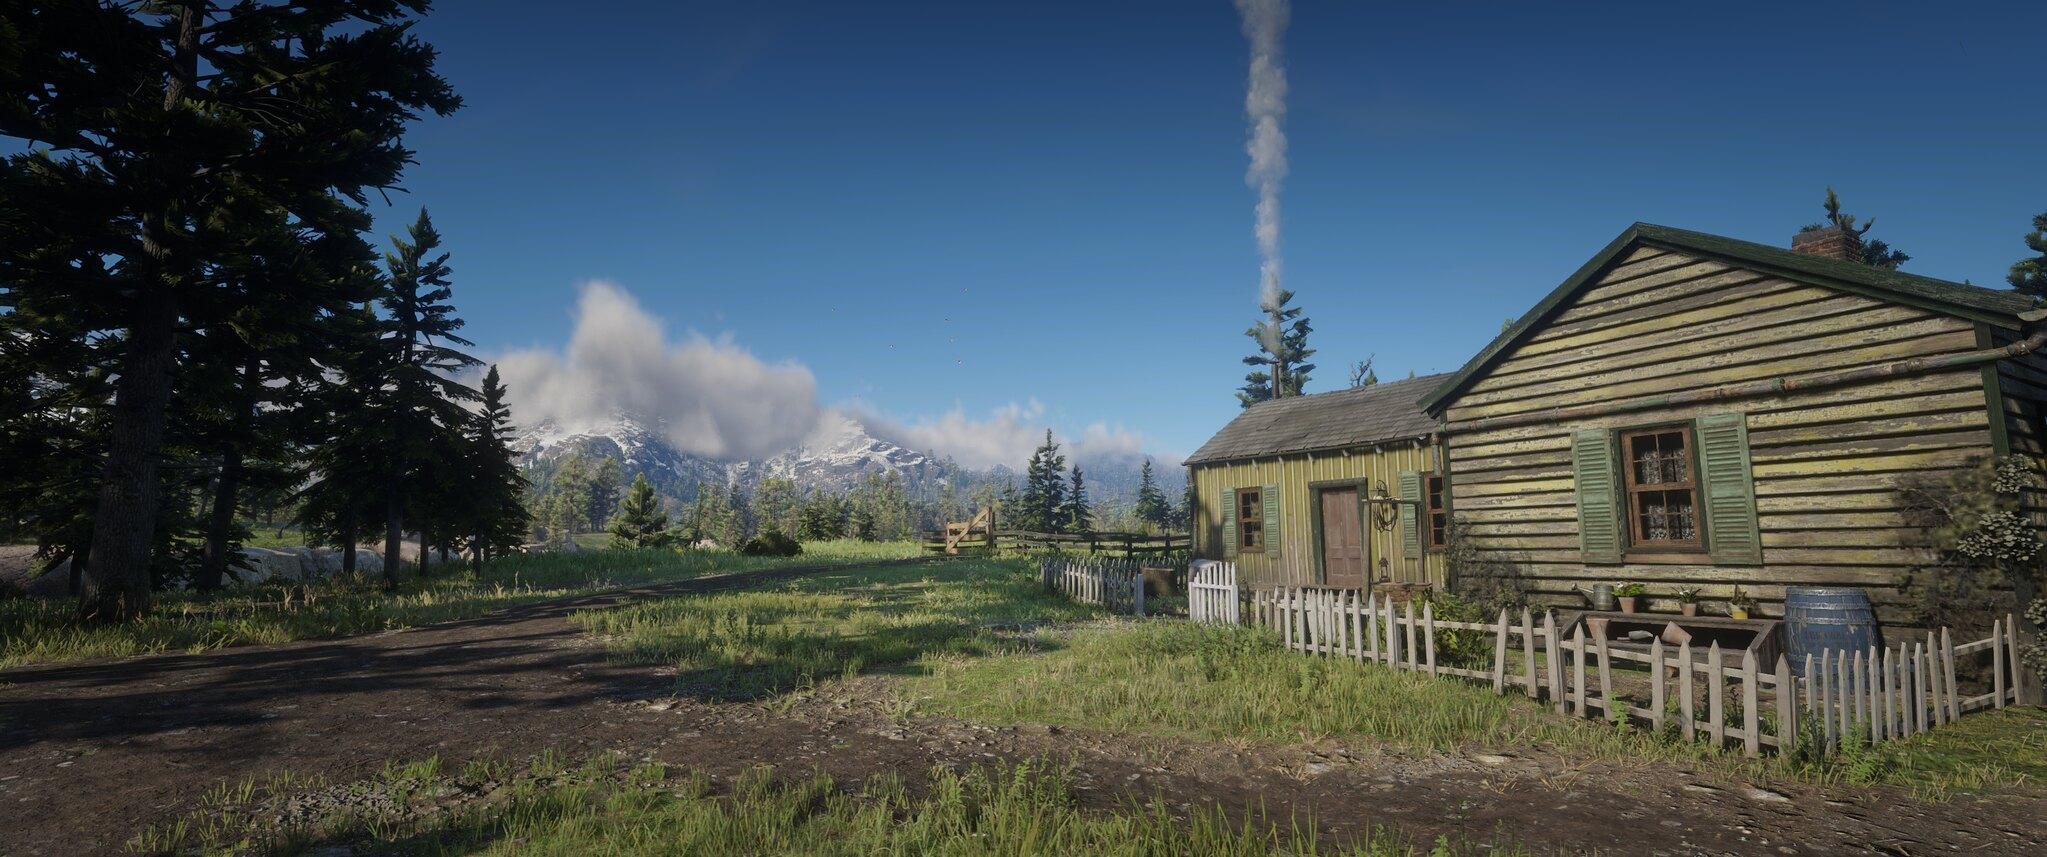 49033625387_3784f0819d_k.jpg - Red Dead Redemption 2